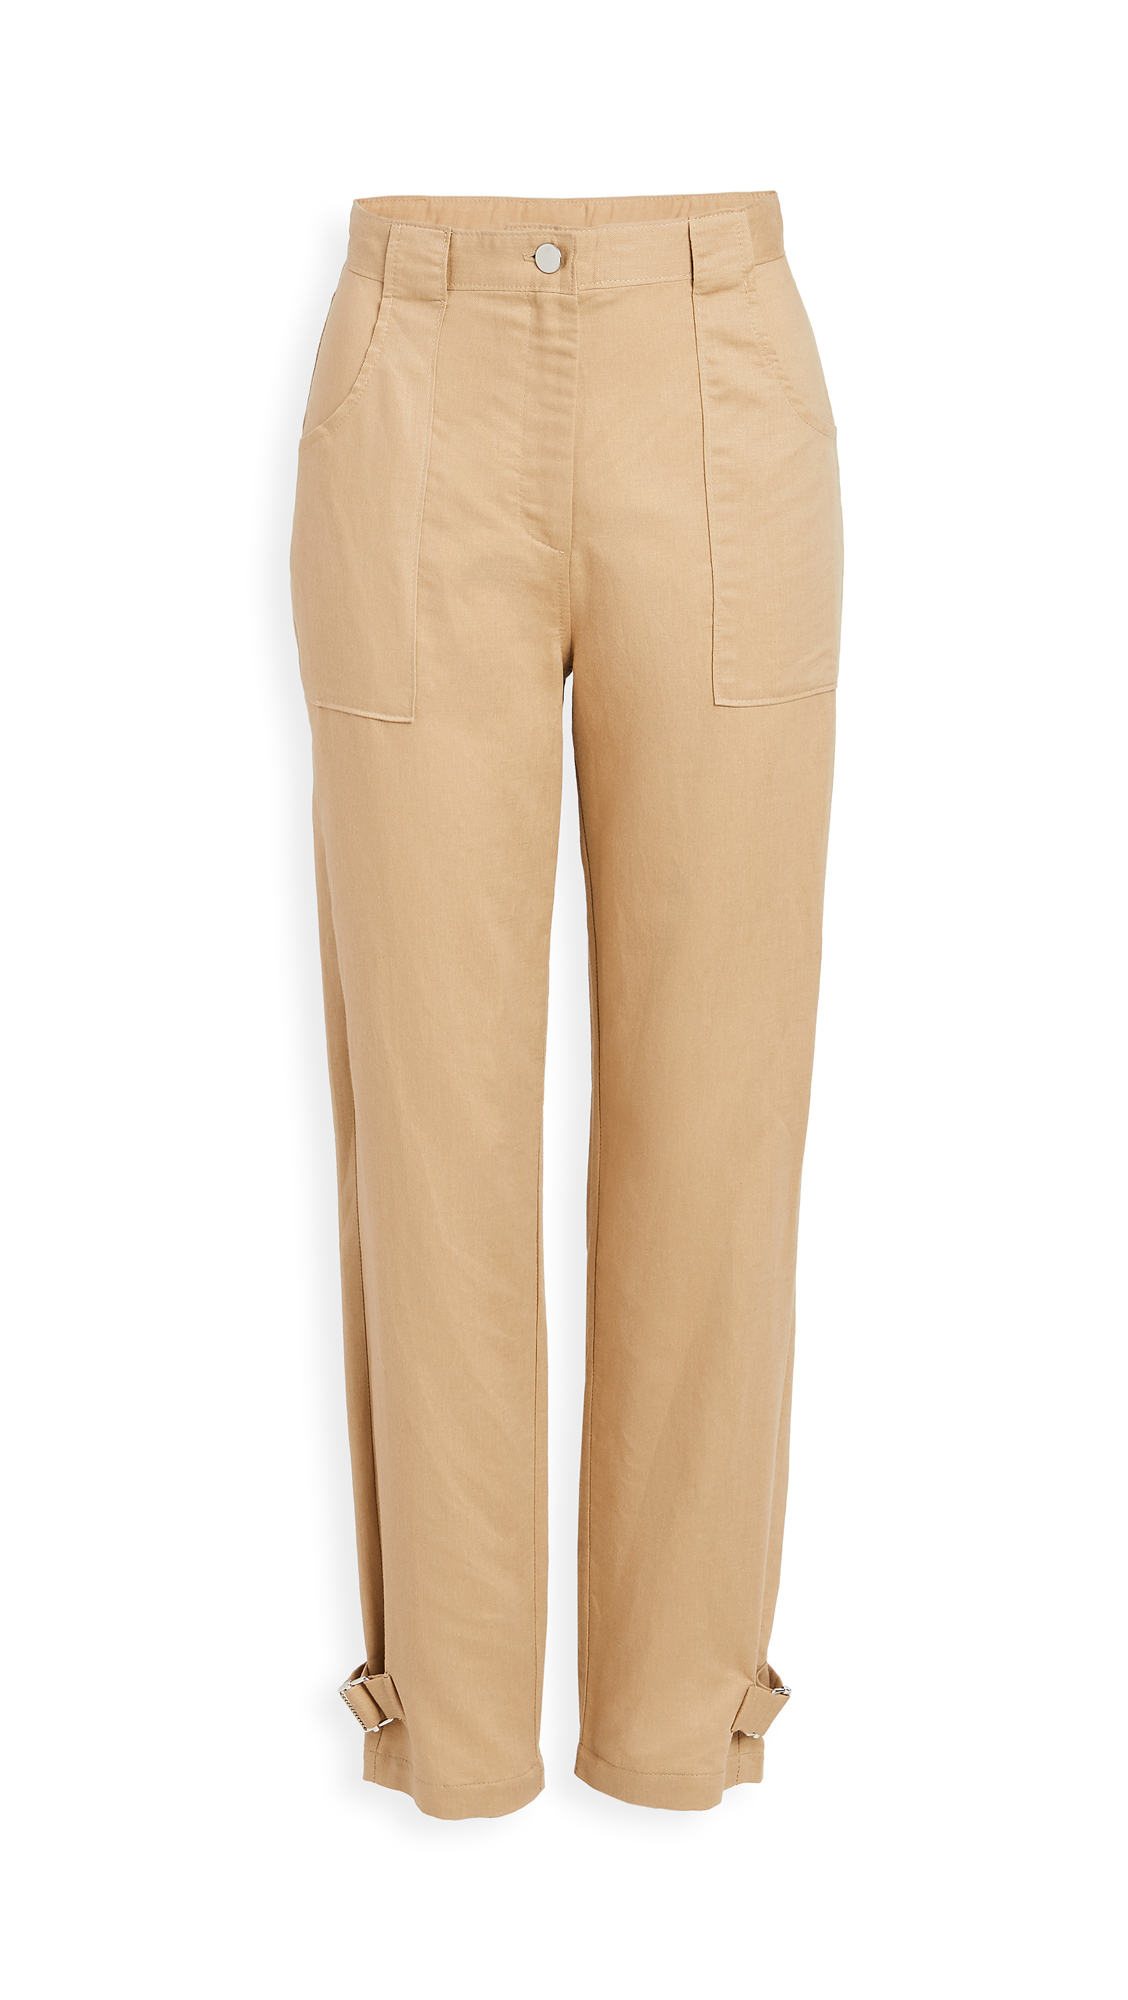 The Range Tide Linen Twill Utilitarian Straight Pants